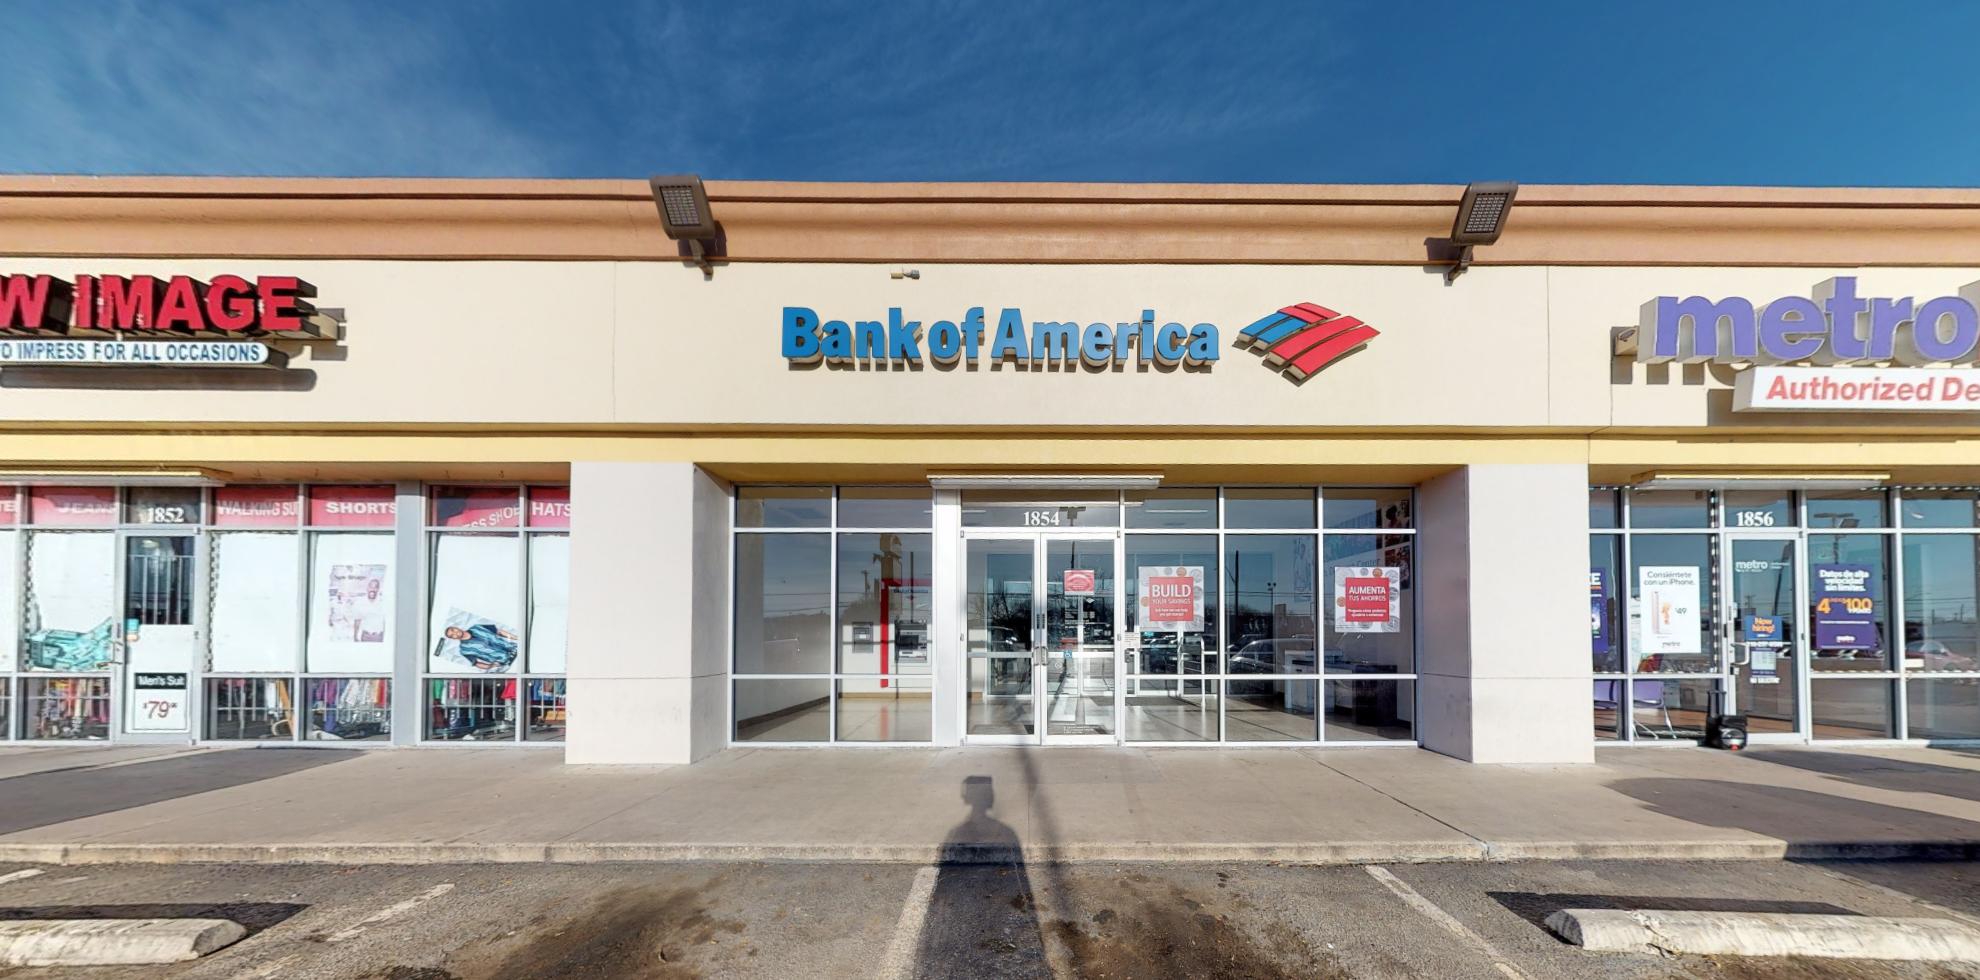 Bank of America financial center with drive-thru ATM | 1854 S WW White Rd, San Antonio, TX 78220